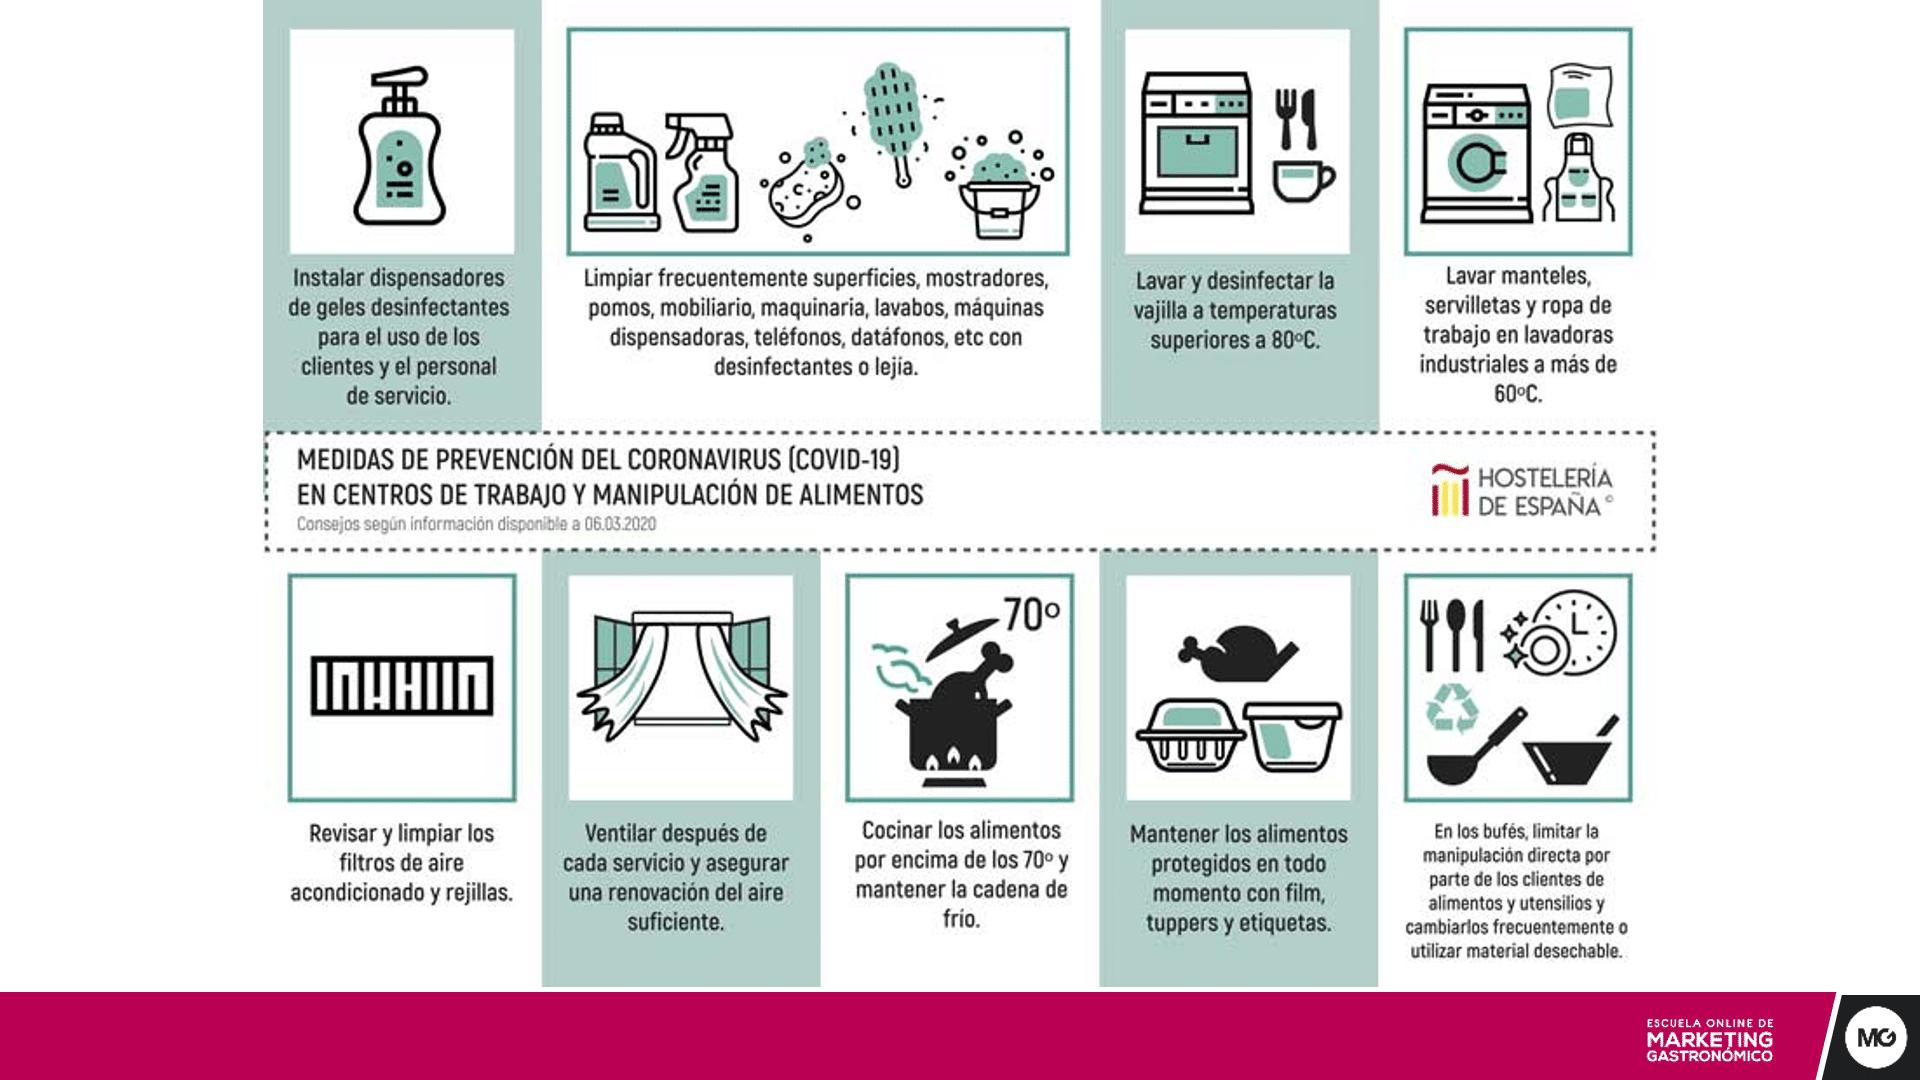 como sobrevivir al coronavirus restaurantes bares y cafeterias hosteleria